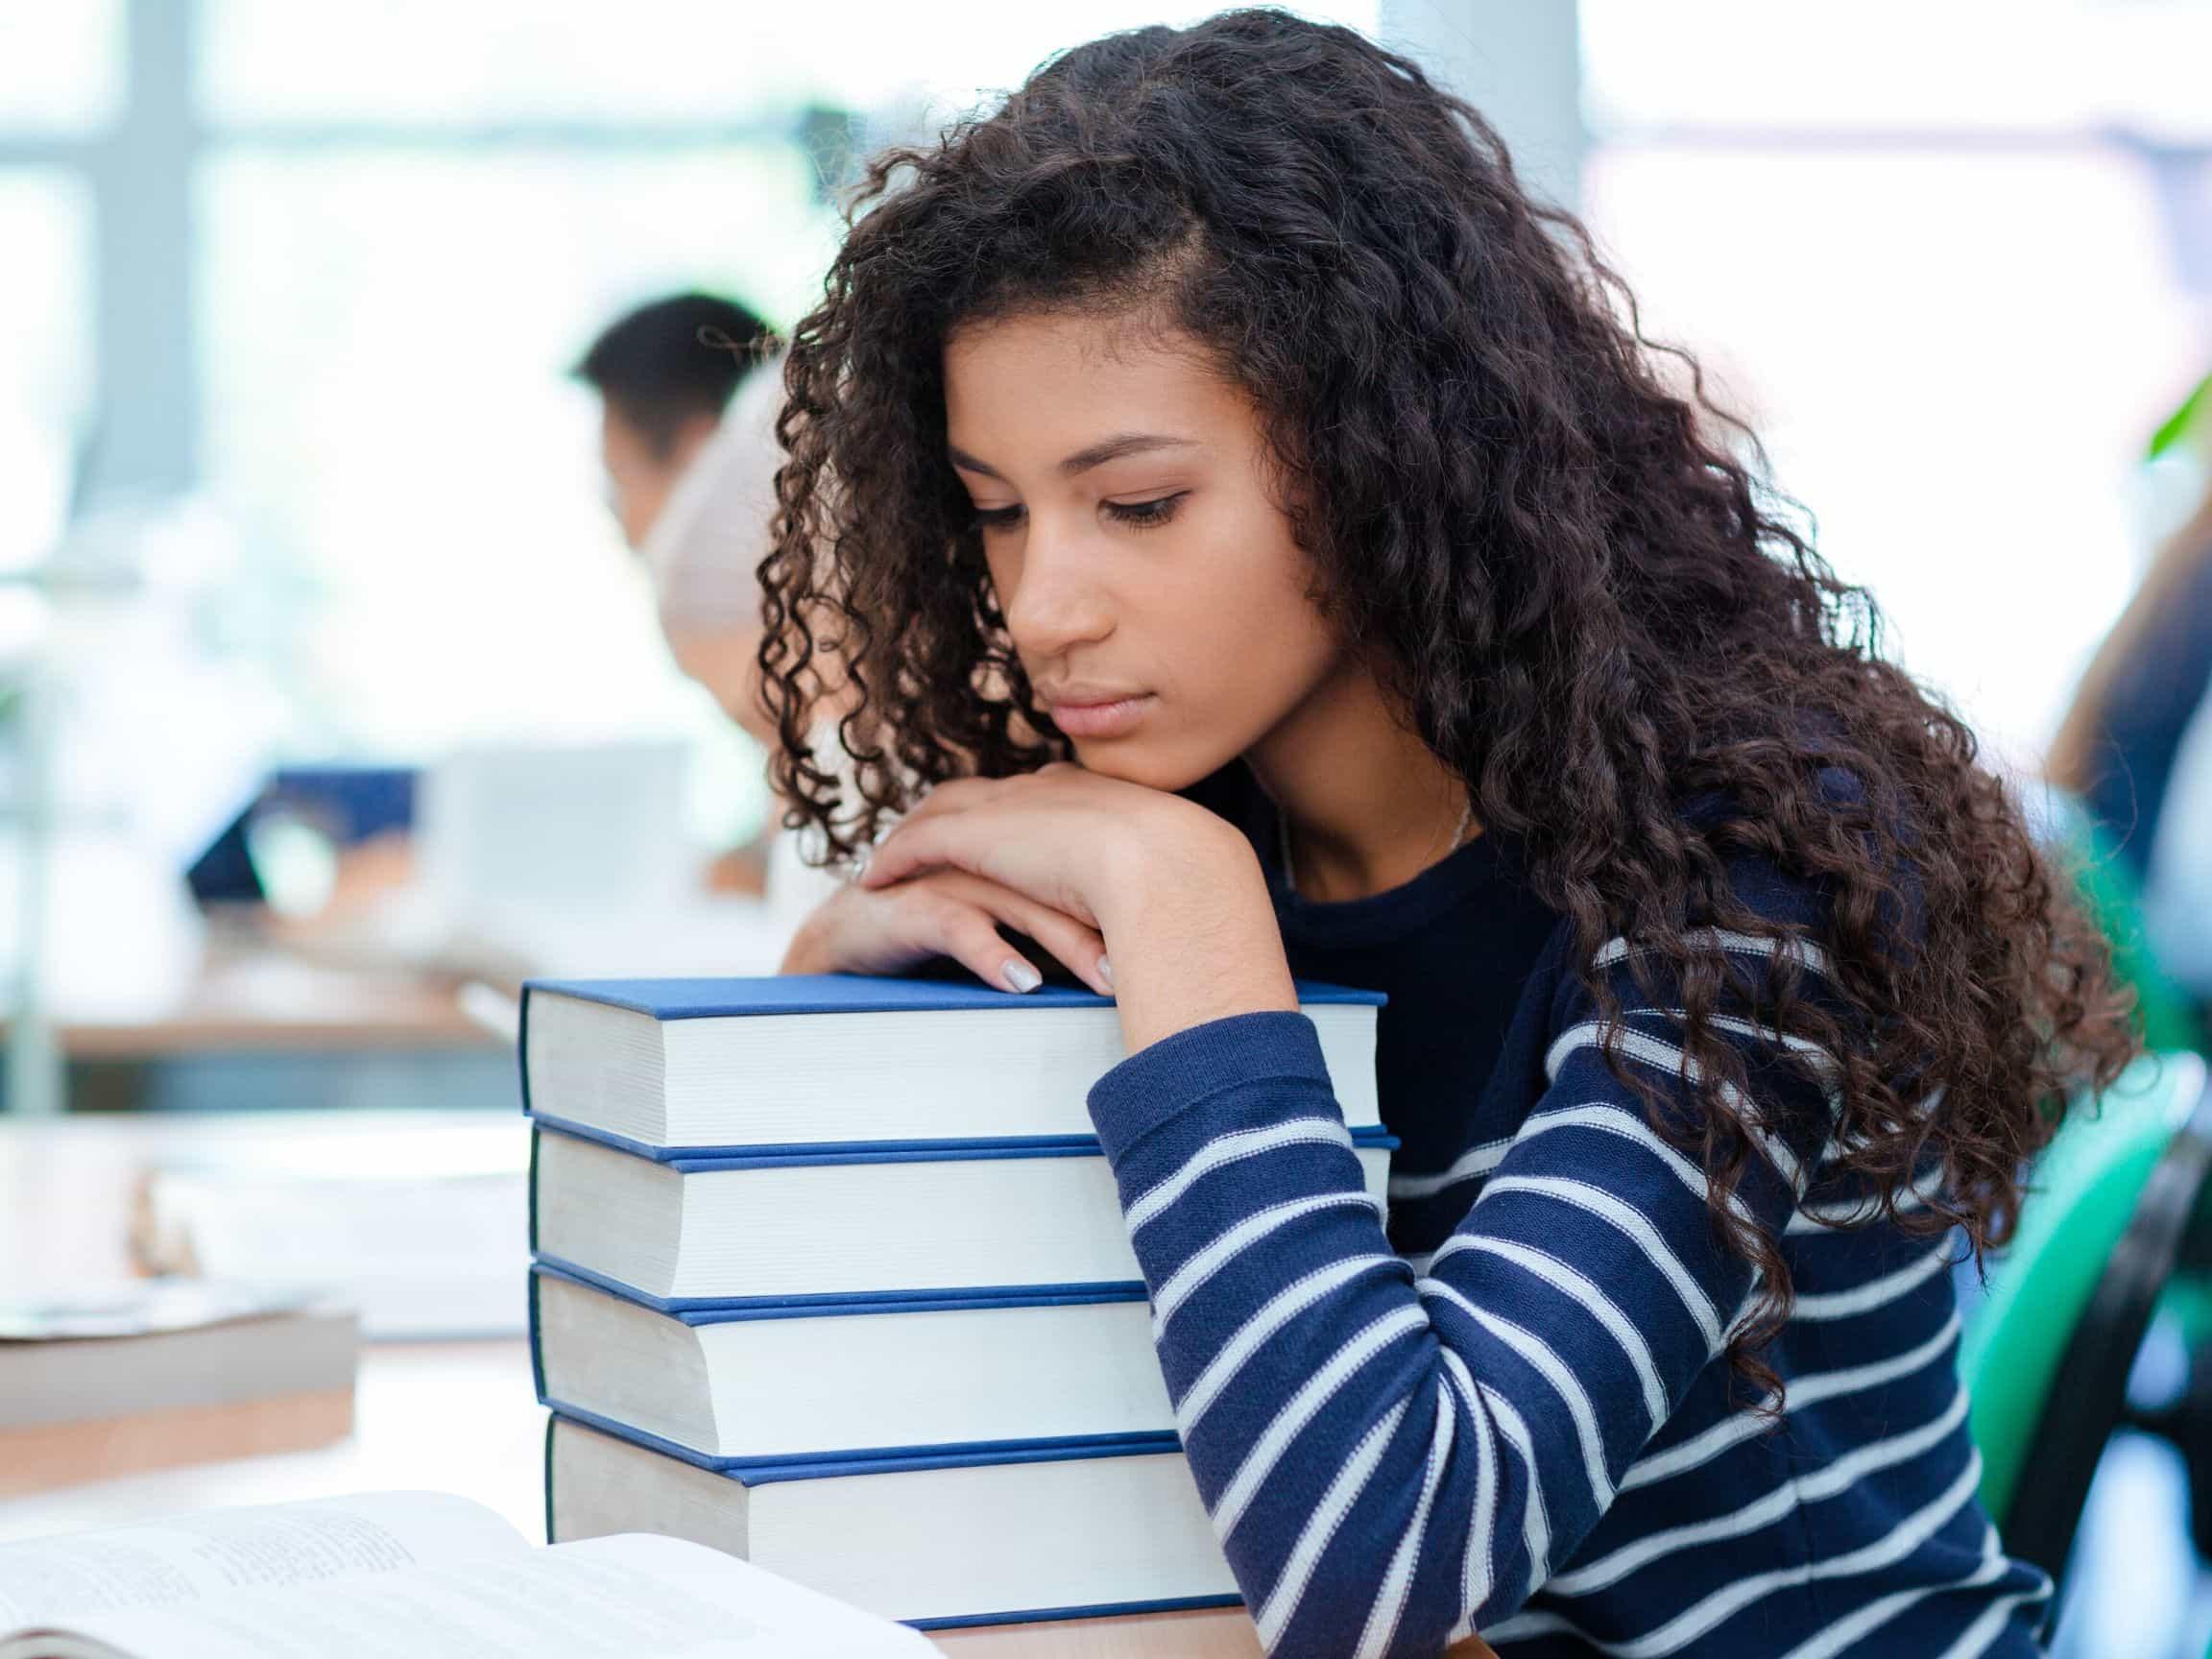 A female college student slumps over a pile of books